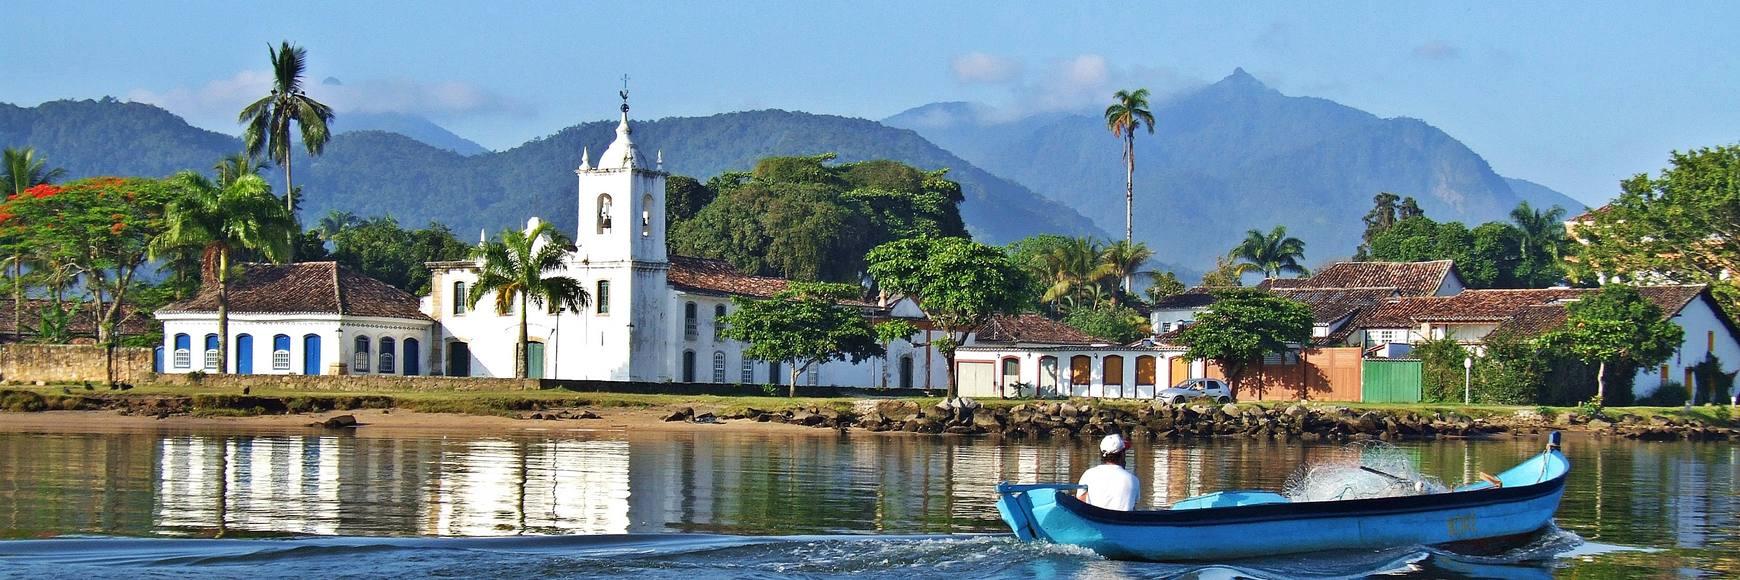 sailboat charter Brazil